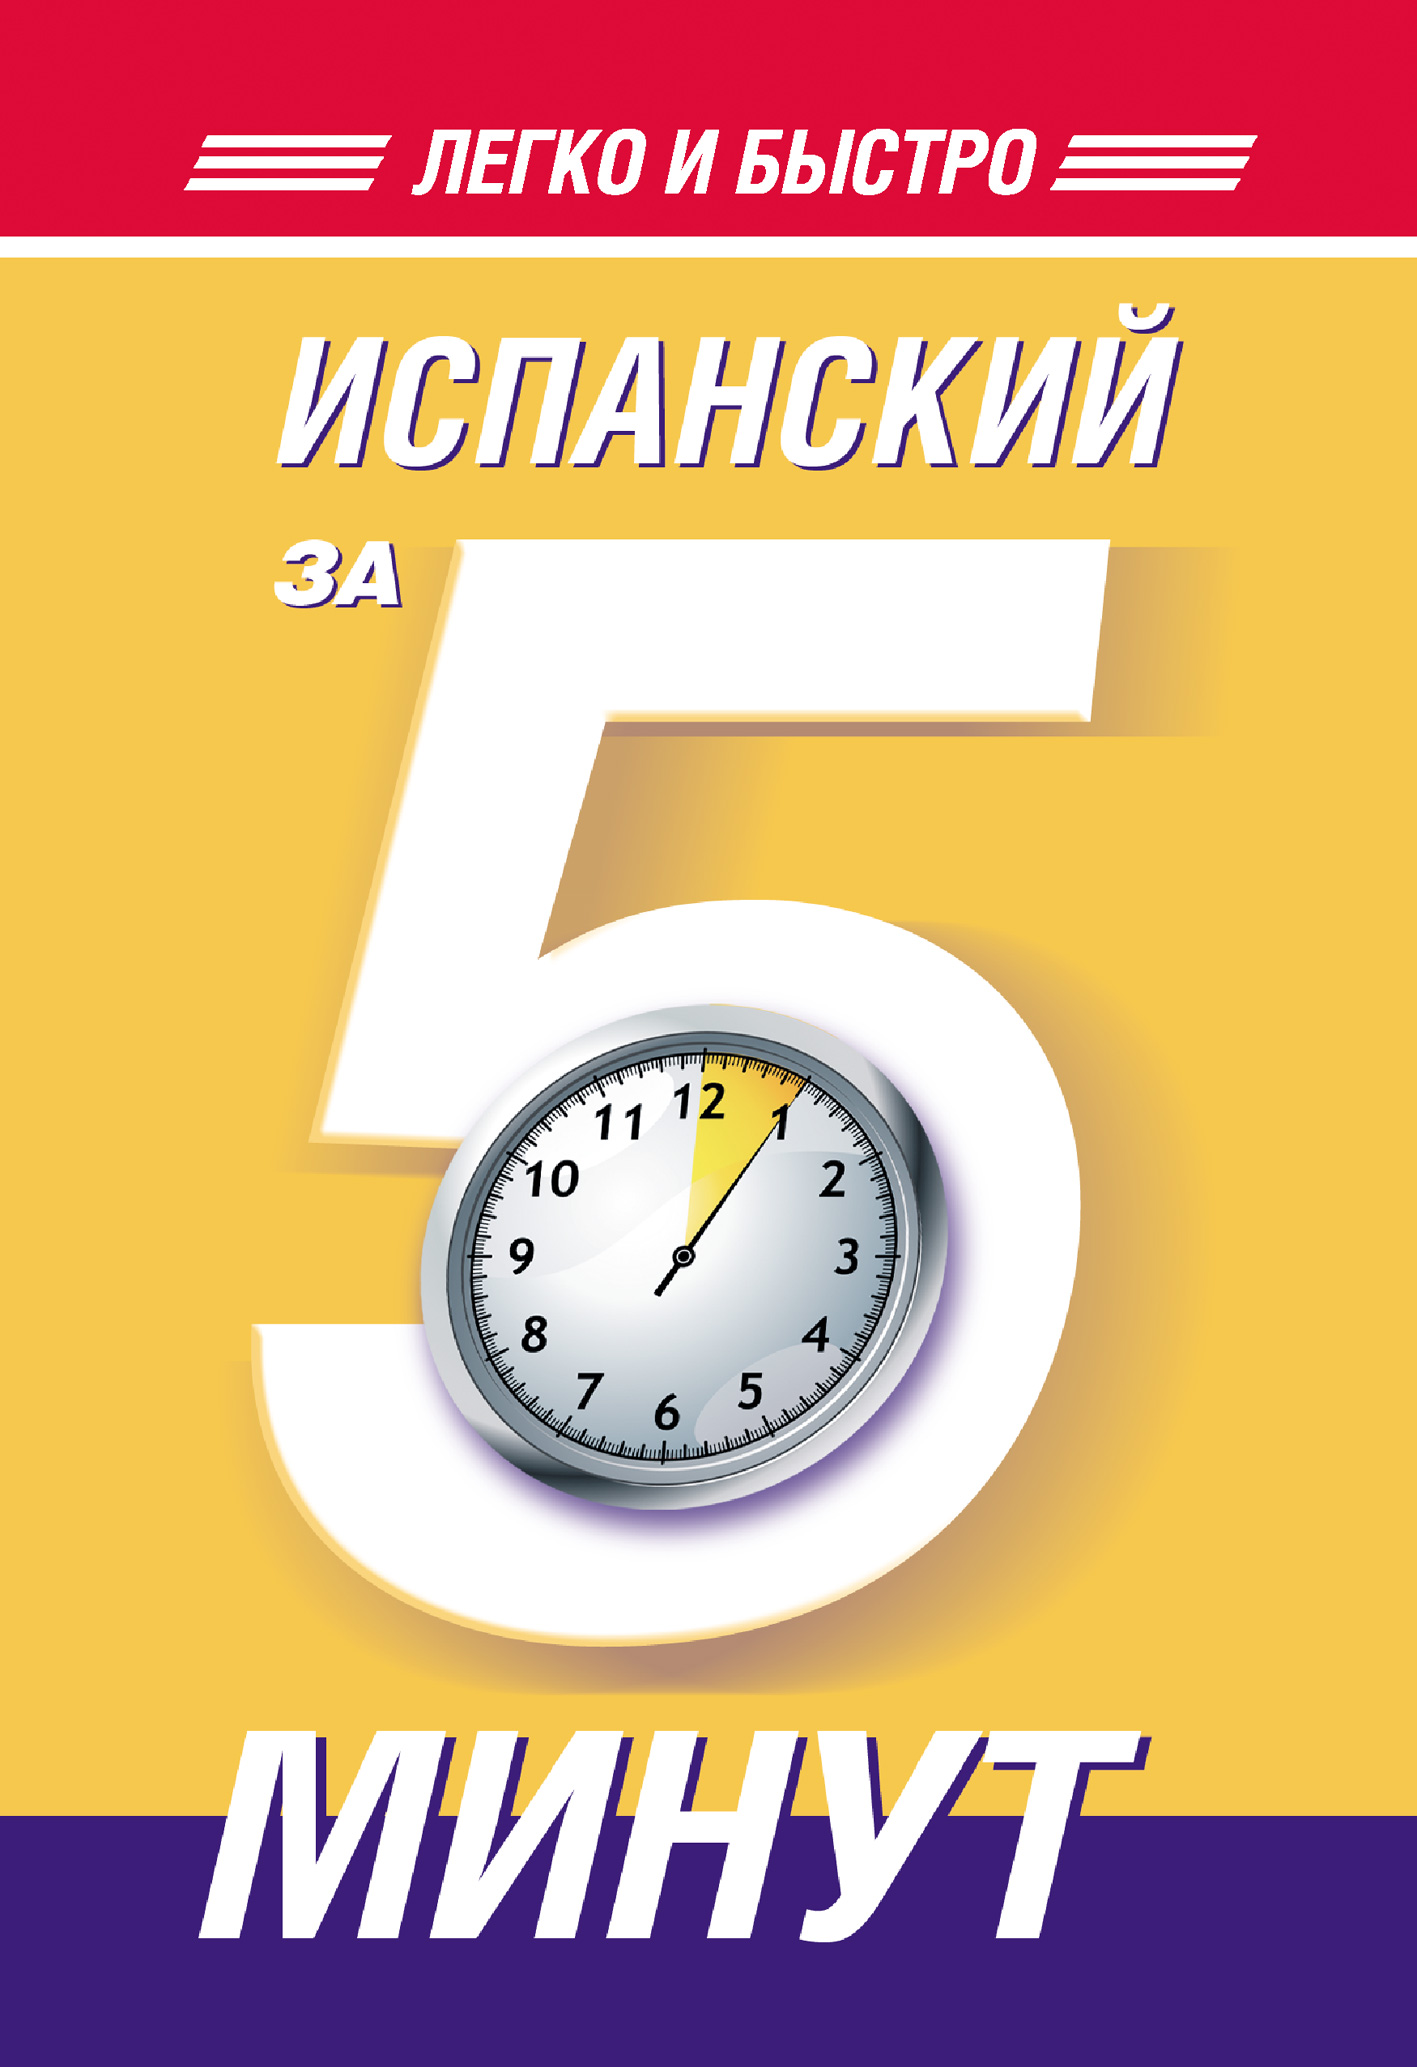 О. А. Кутумина Испанский за 5 минут кутумина о испанский язык за 5 минут в день page 2